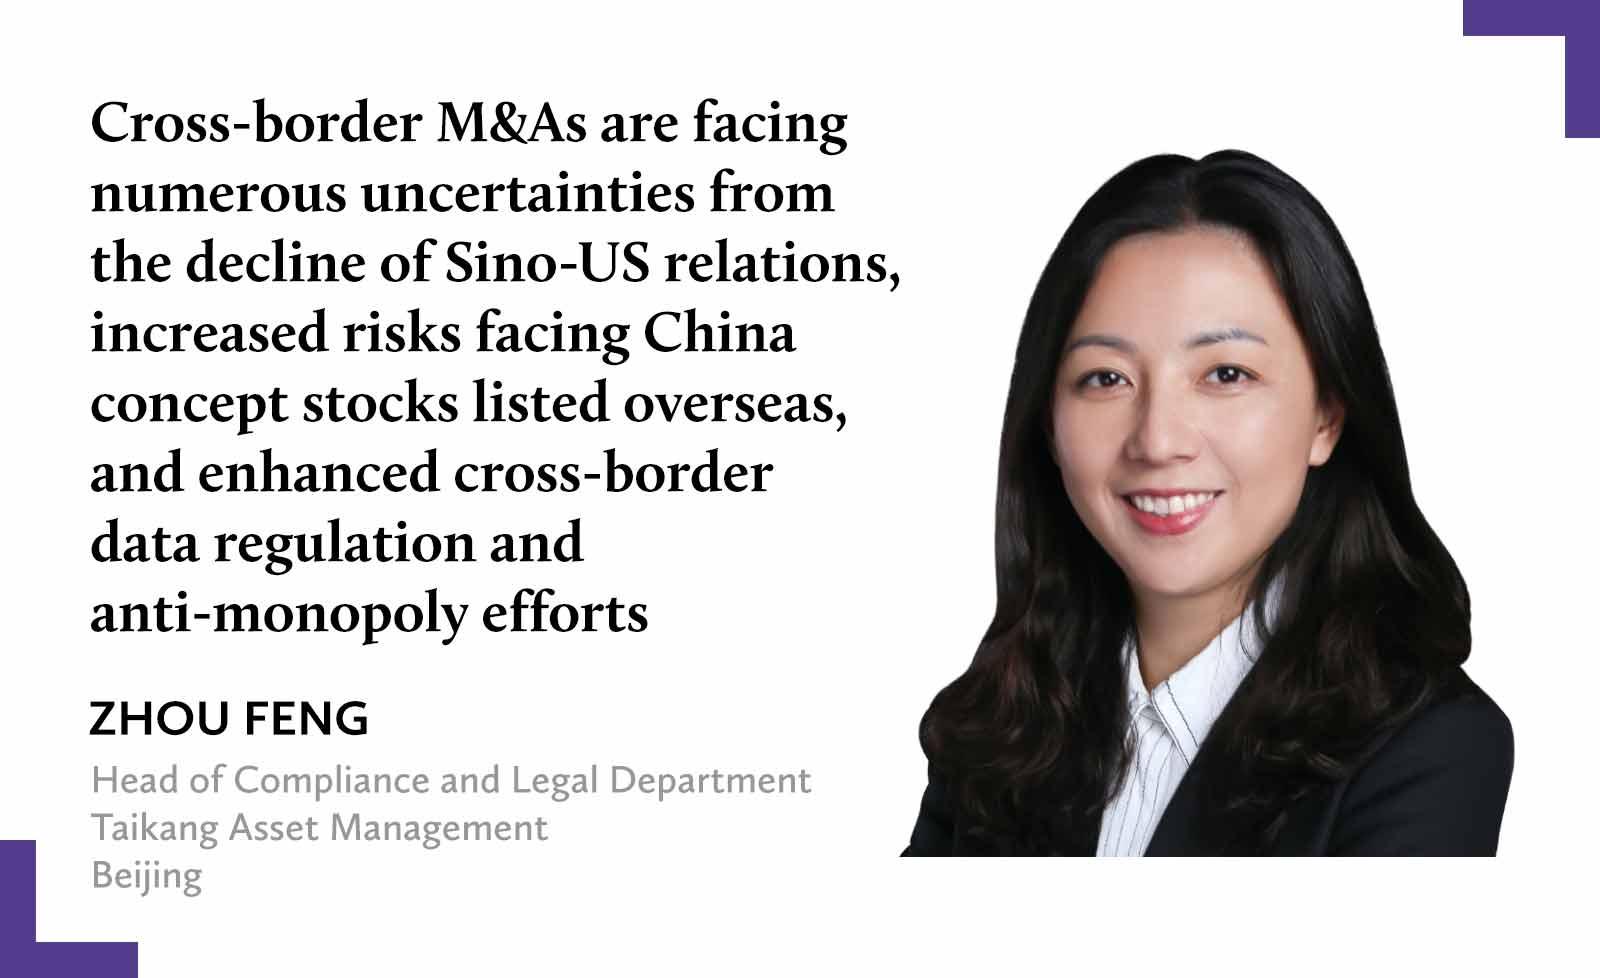 周峰-ZHOU-FENG-泰康资产管理-公司合规负责人,北京-Head-of-Compliance-and-Legal-Department-Taikang-Asset-Management-Beijing-(Eng)